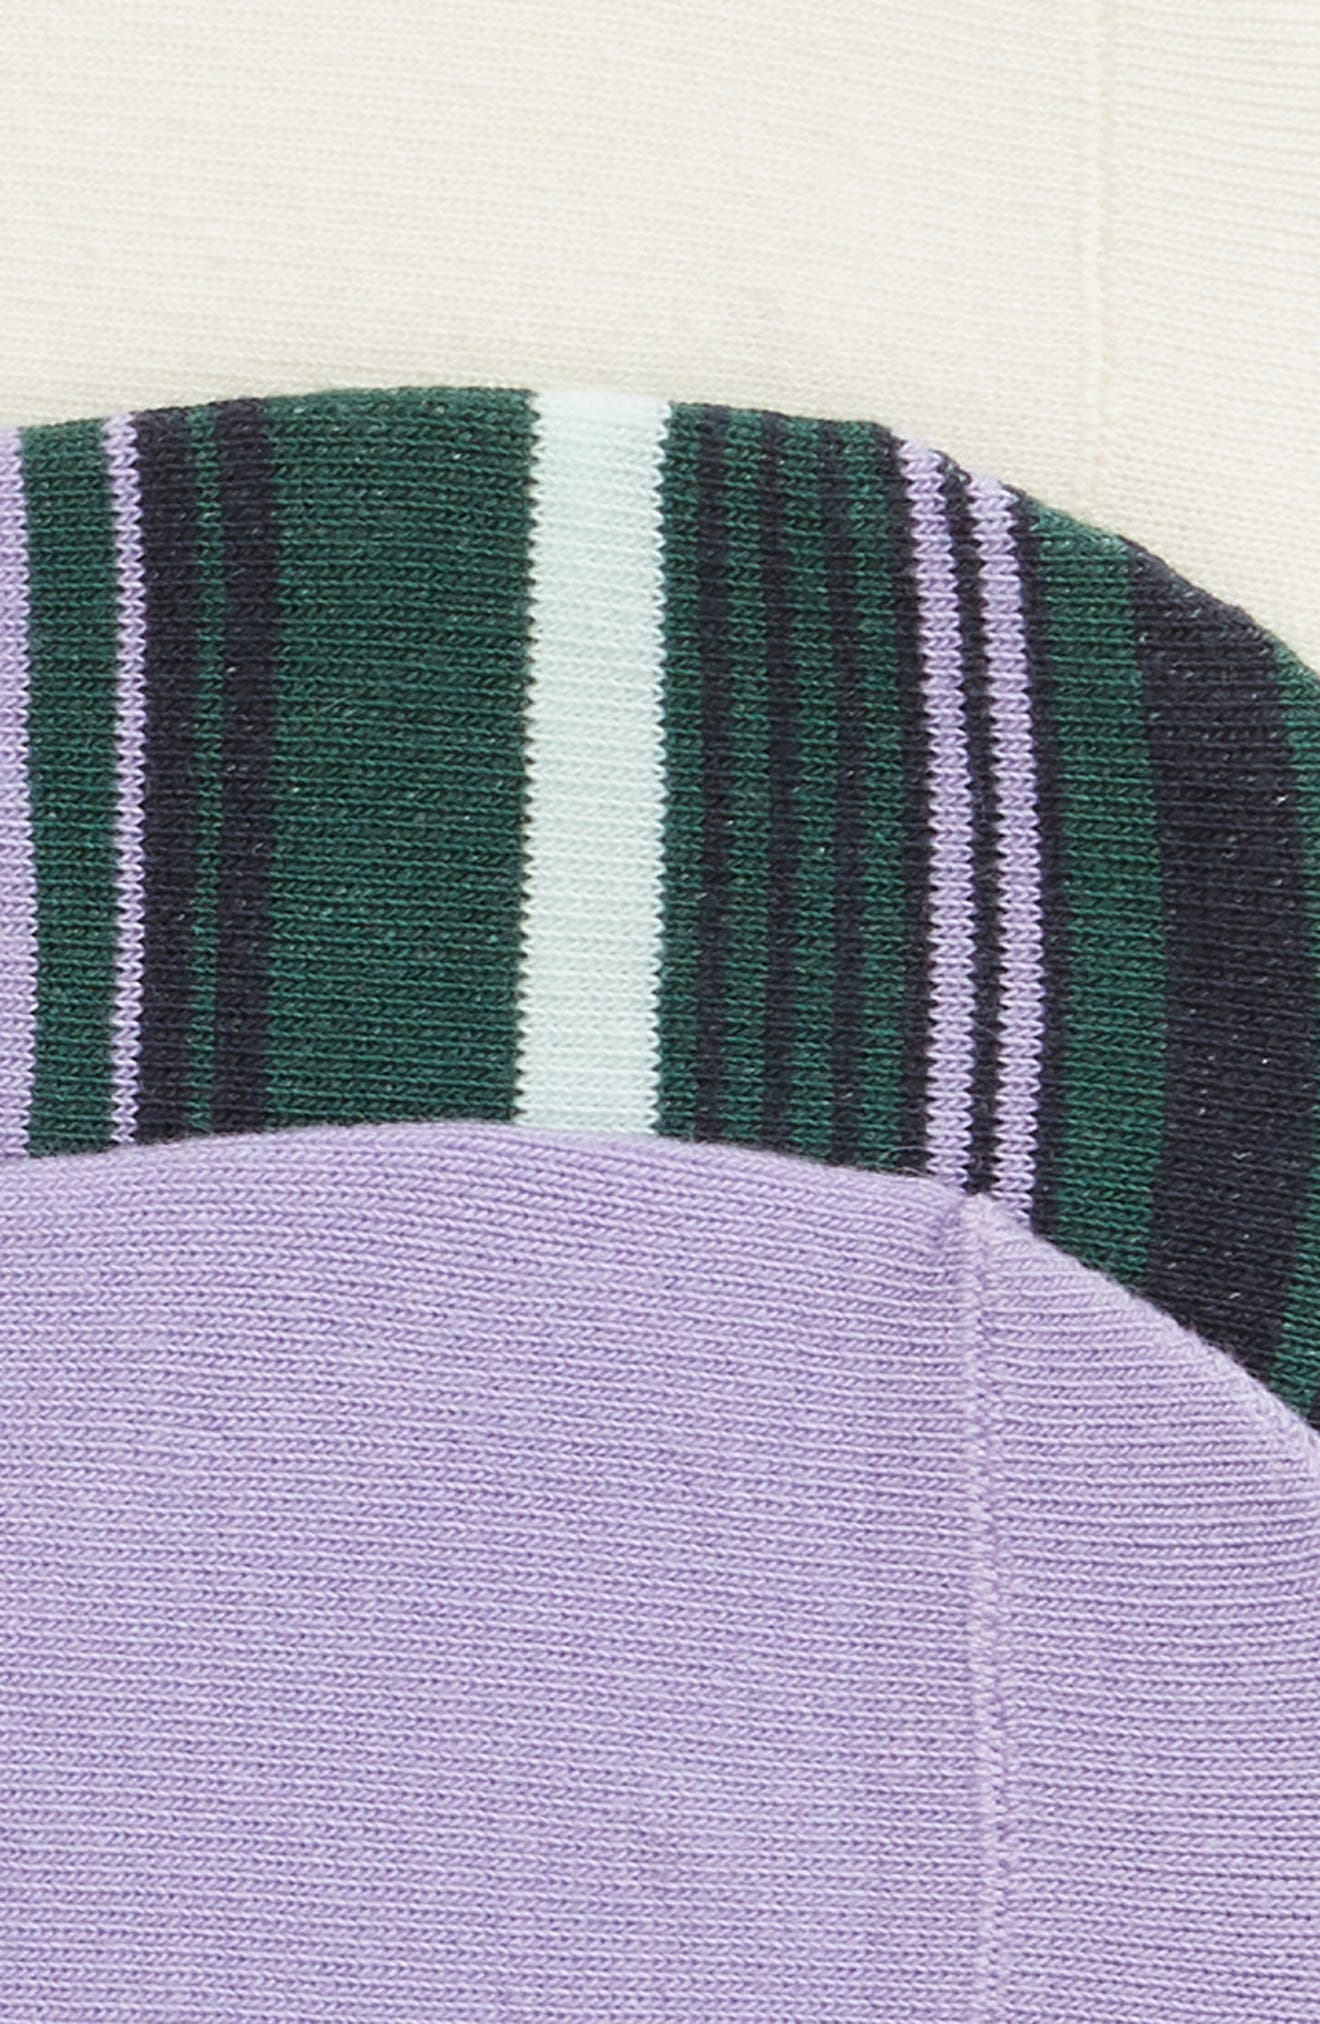 NORDSTROM,                             3-Pack No-Show Liner Socks,                             Alternate thumbnail 2, color,                             PURPLE MITTEN MULTI